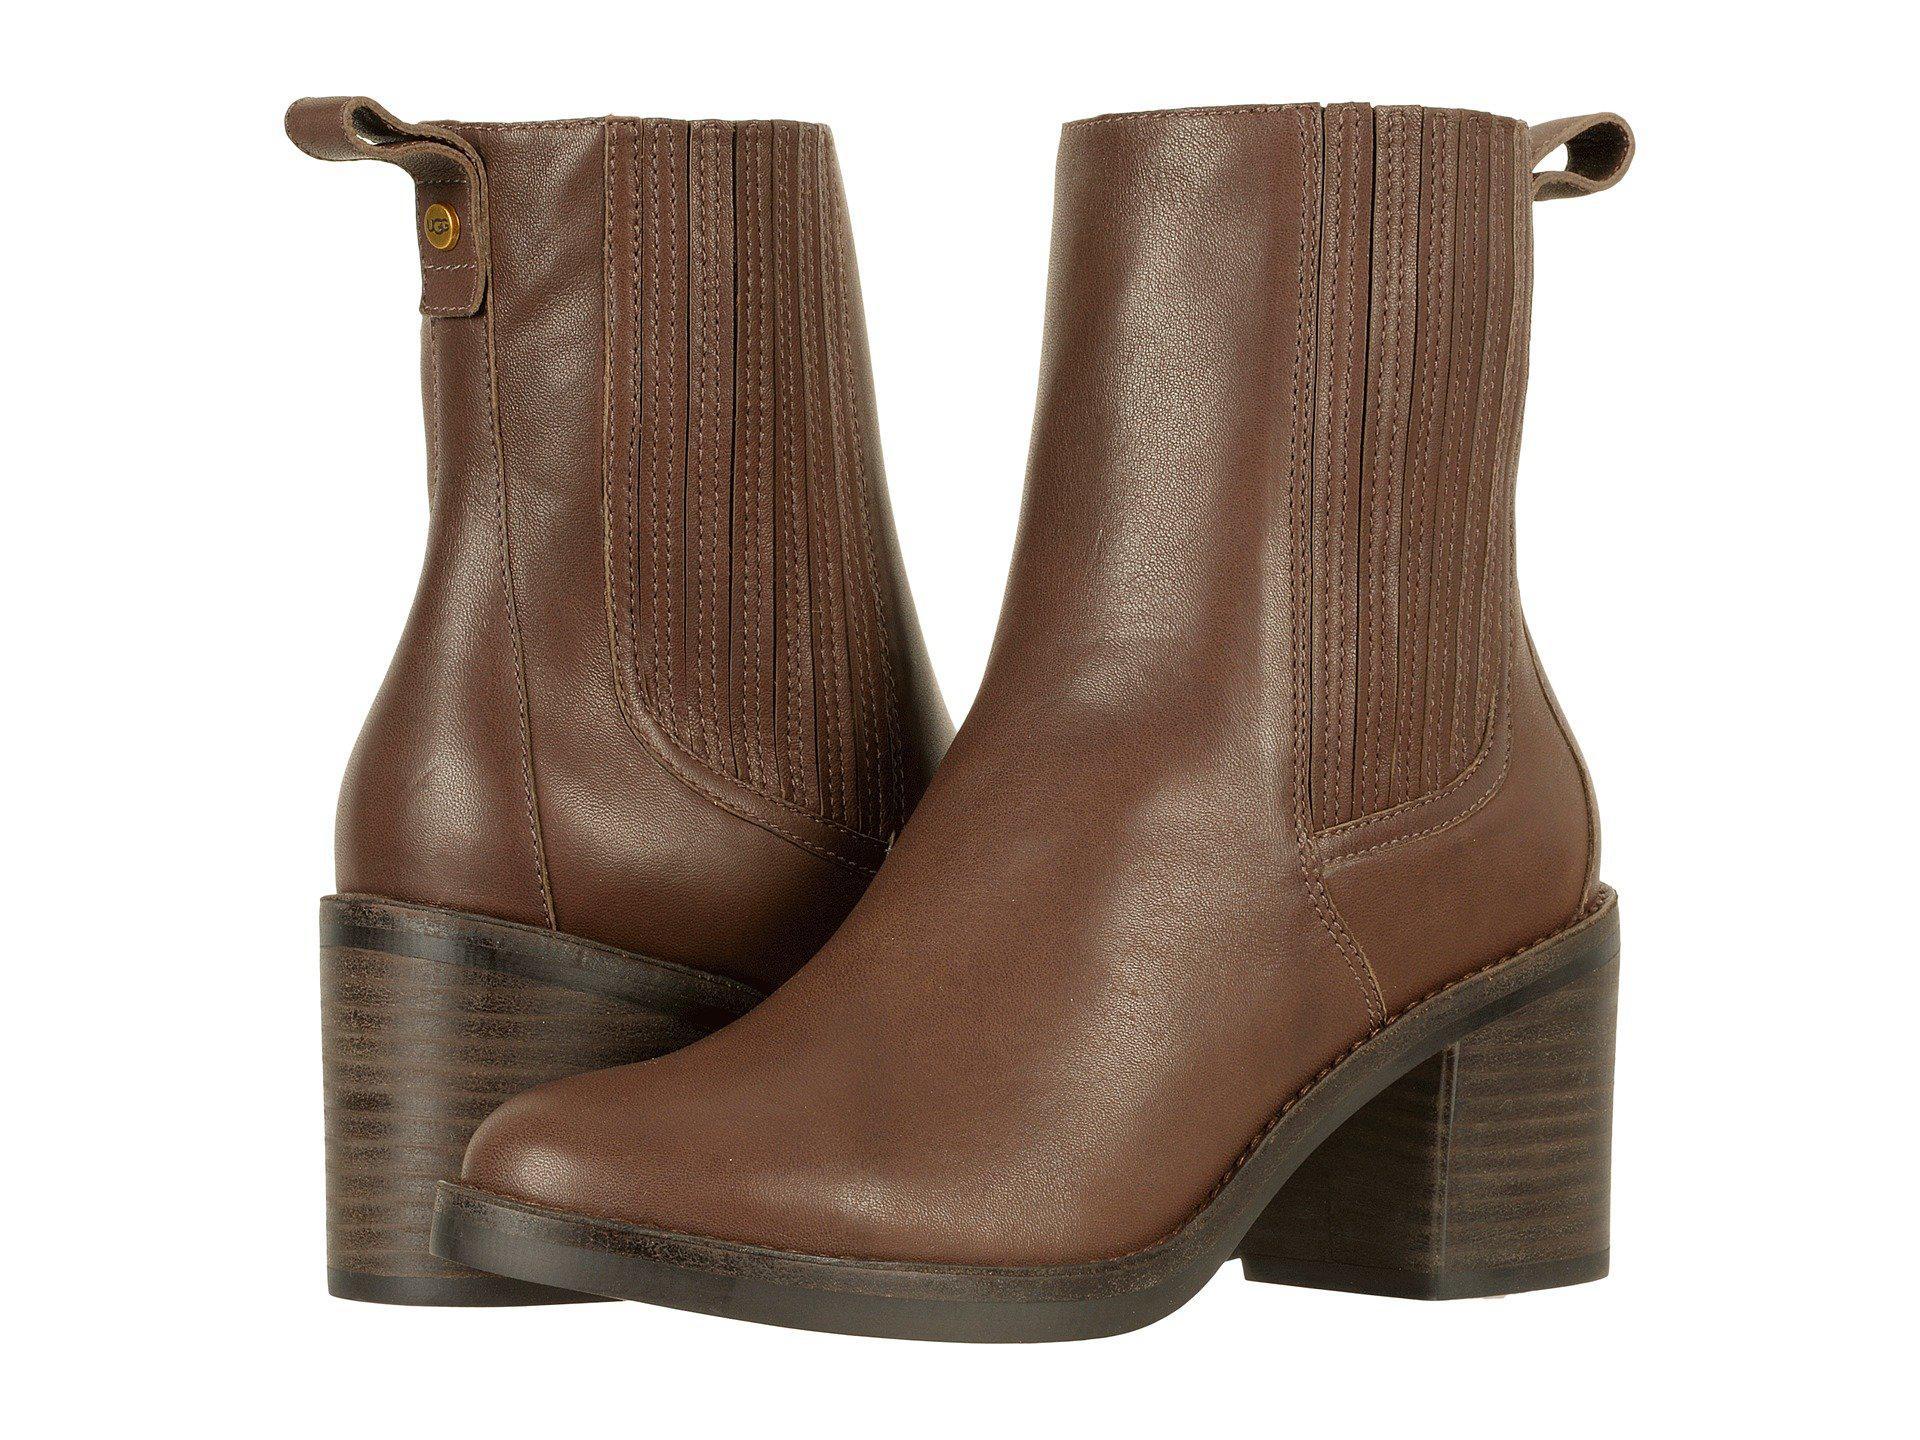 cbe0925c216 Ugg Brown Camden Exotic (chocolate) Women's Boots